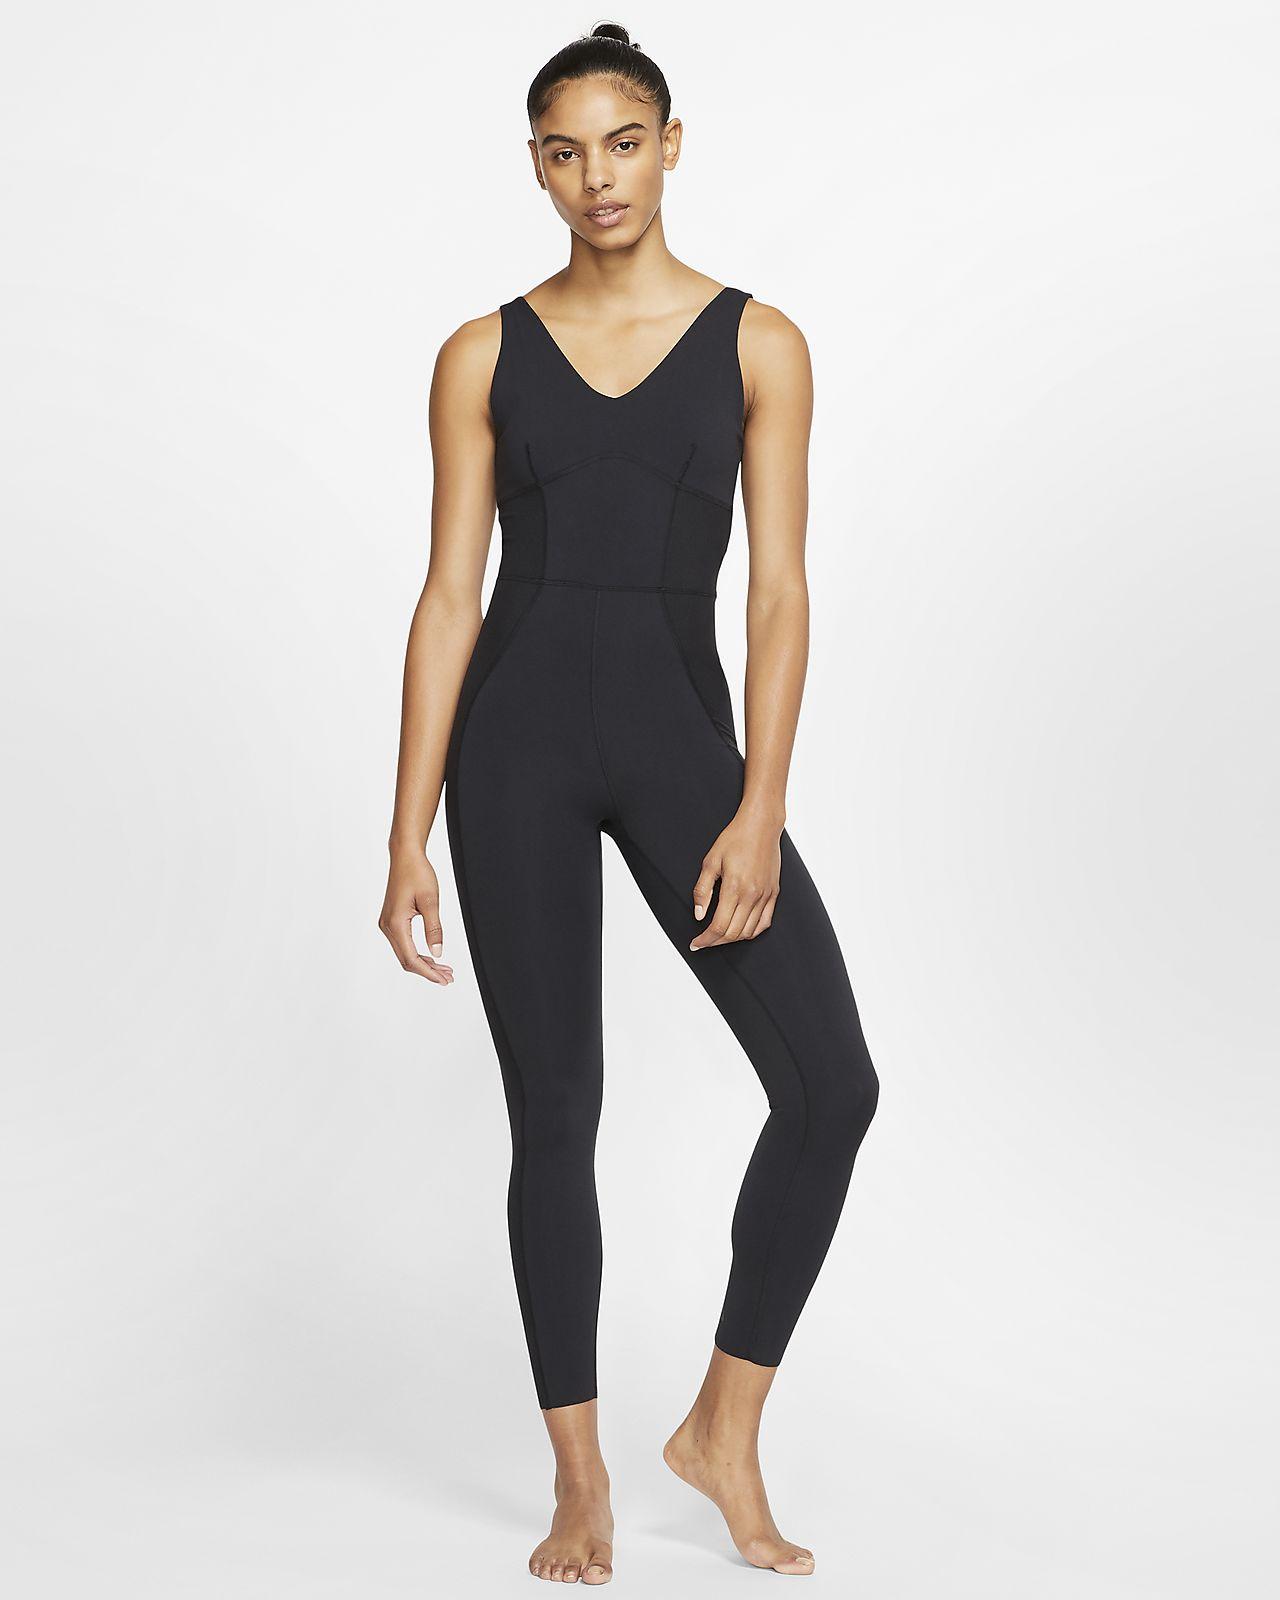 Nike Yoga Luxe Women's Jumpsuit